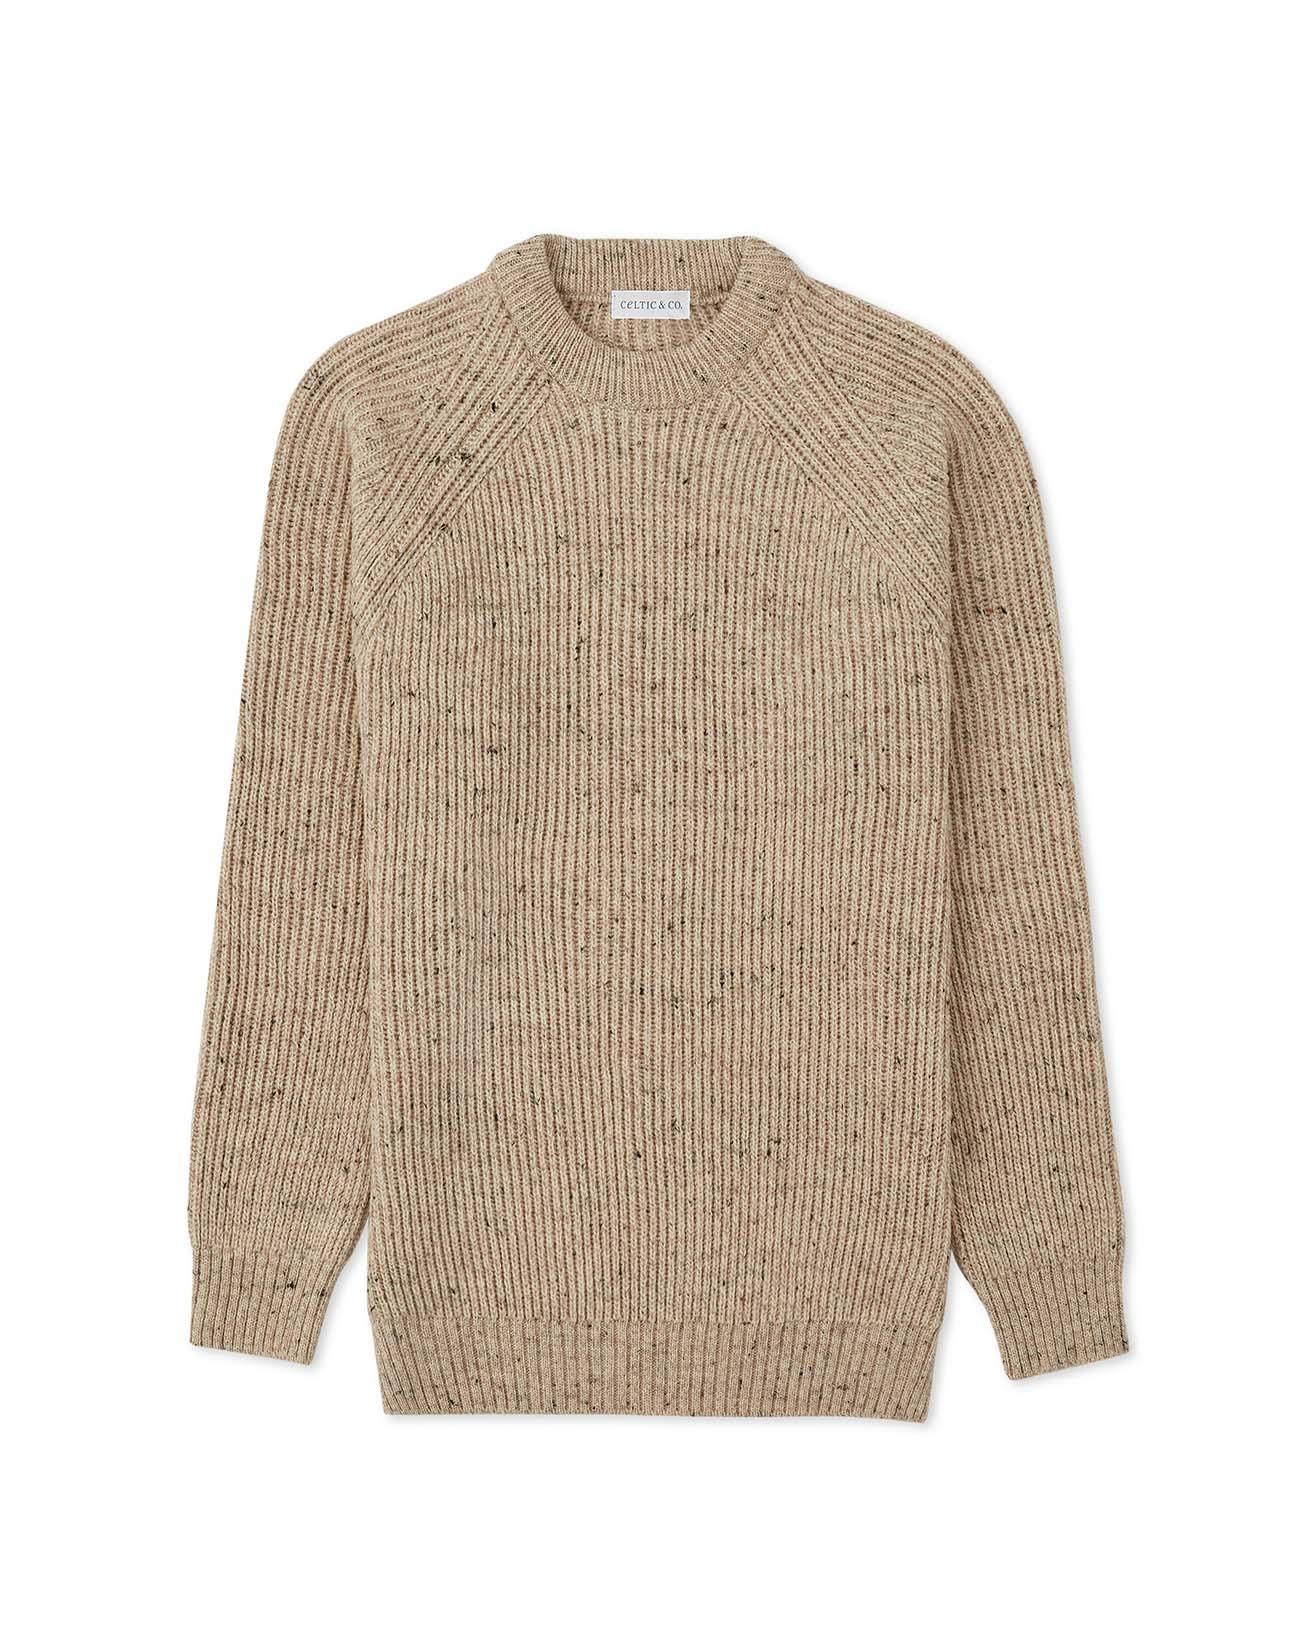 Men's Ribbed Fishermans Sweater